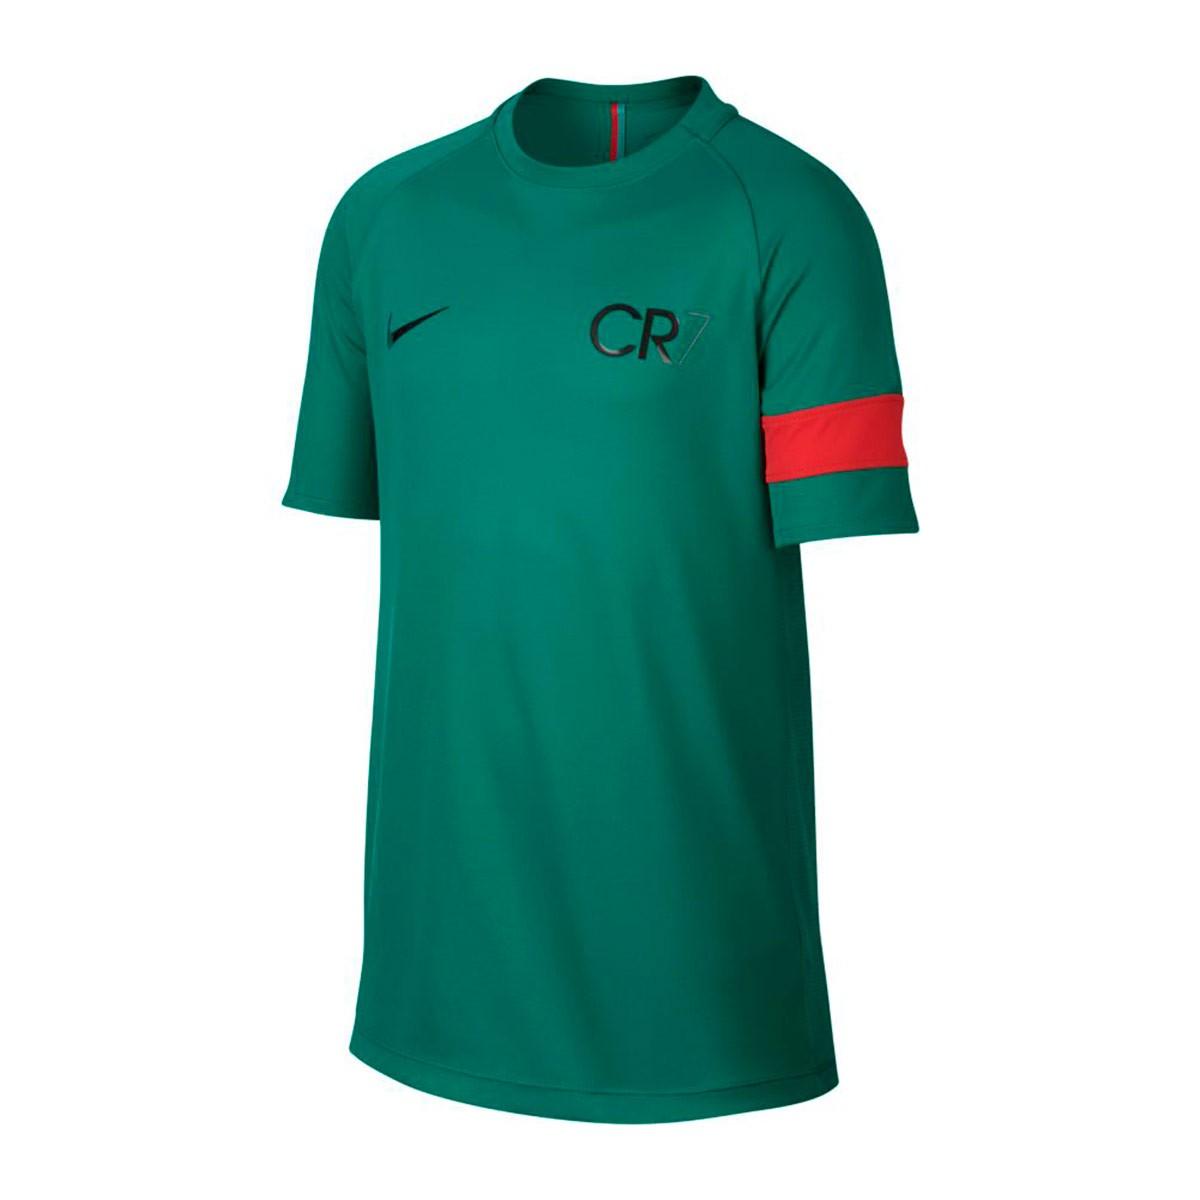 Jersey Nike Dry Academy CR7 Niño Kinetic green-Deep pewter ... f149c4cf95ba1